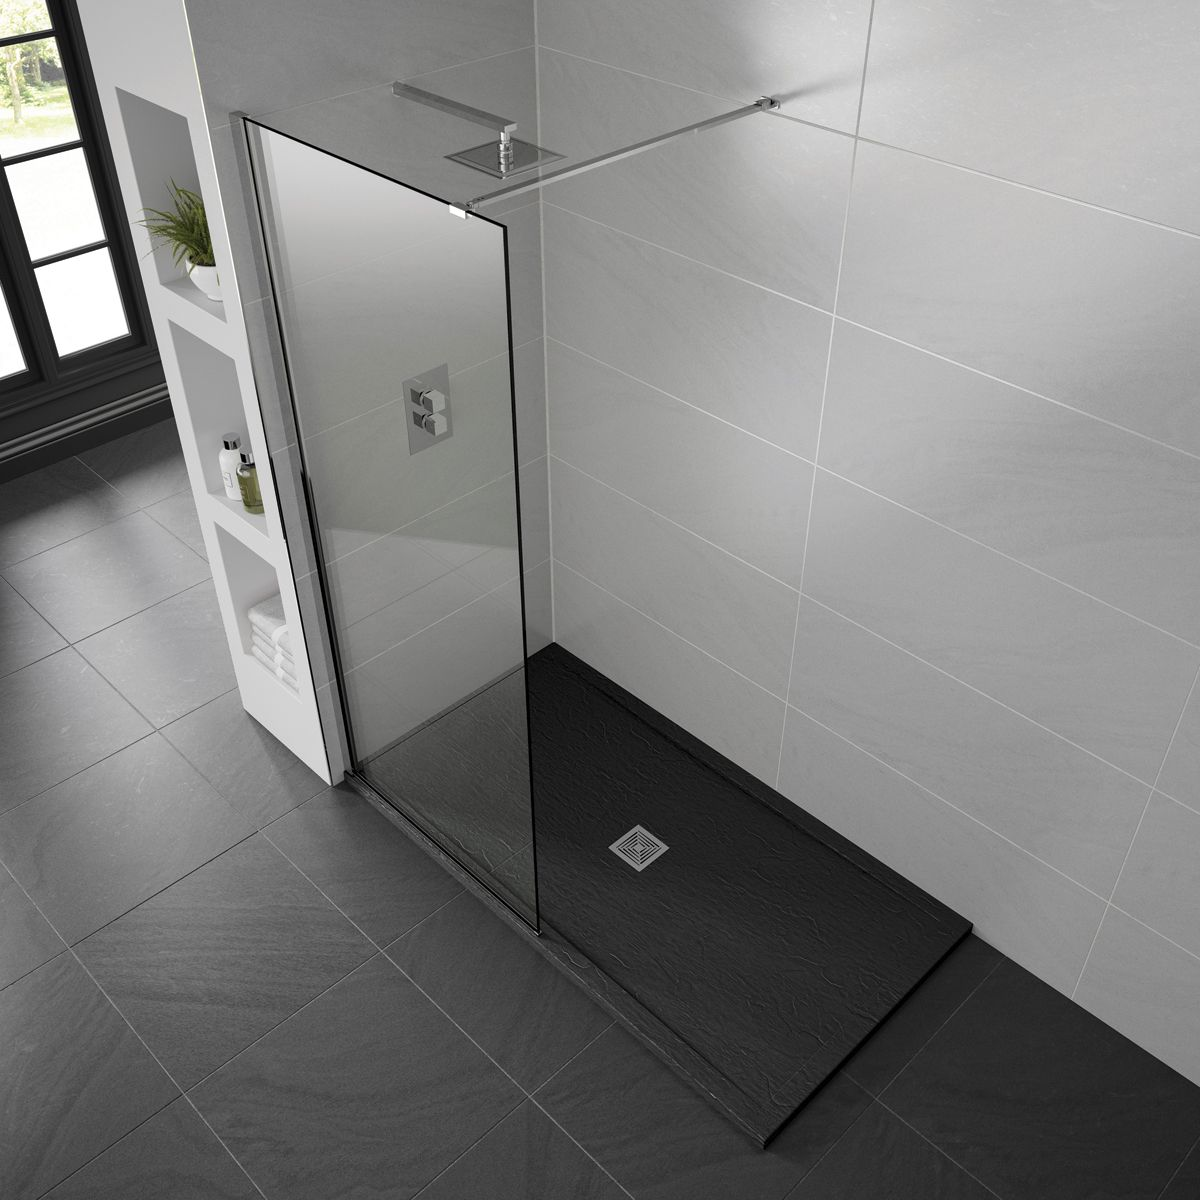 Aquadart Black Slate Shower Tray 1600 x 900 Lifestyle